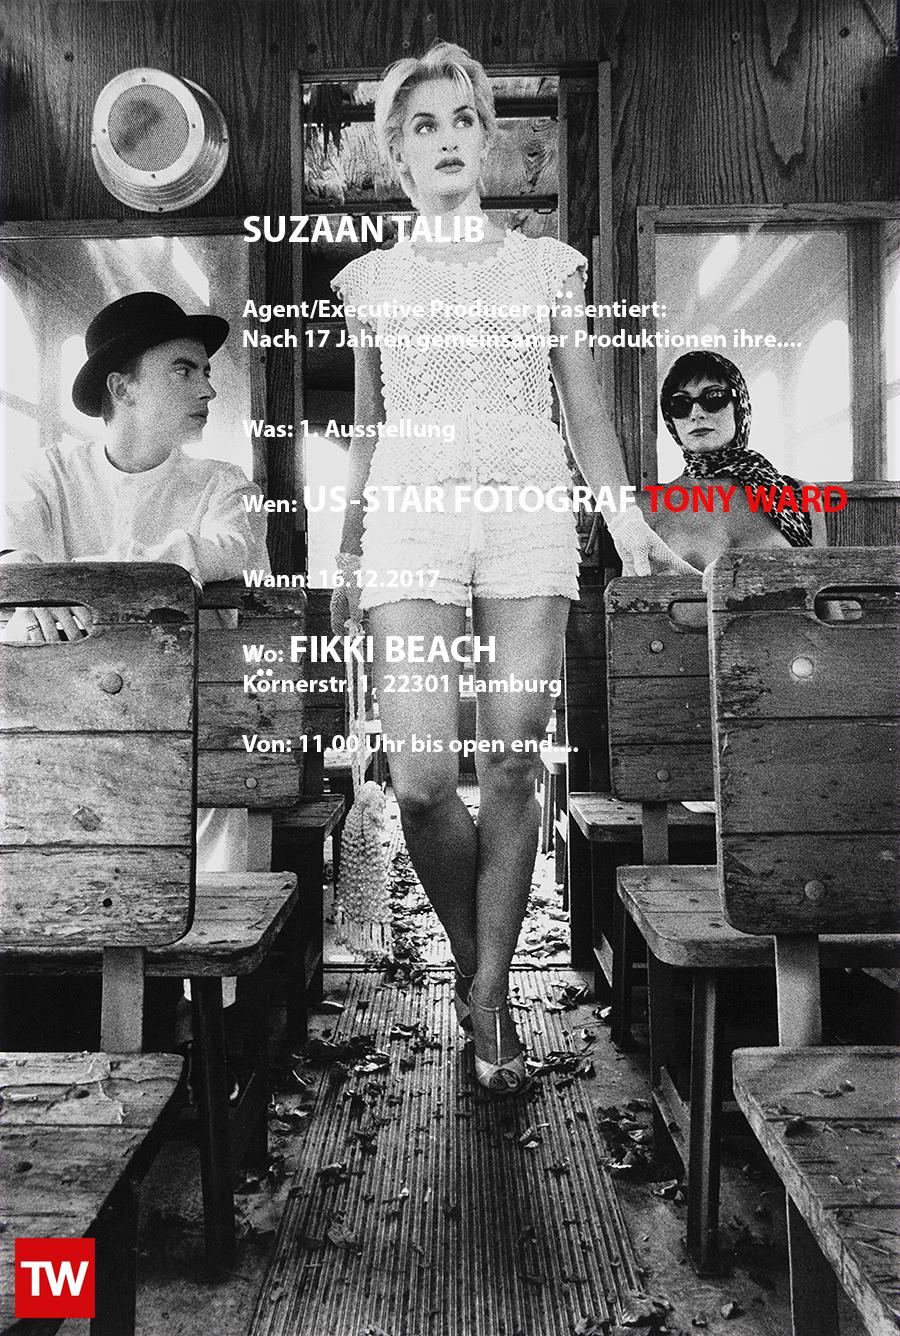 Tony_Ward_photo_exhibition_announcement_Hamburg_Germany_Fikki_Beach_tableaux_vivants